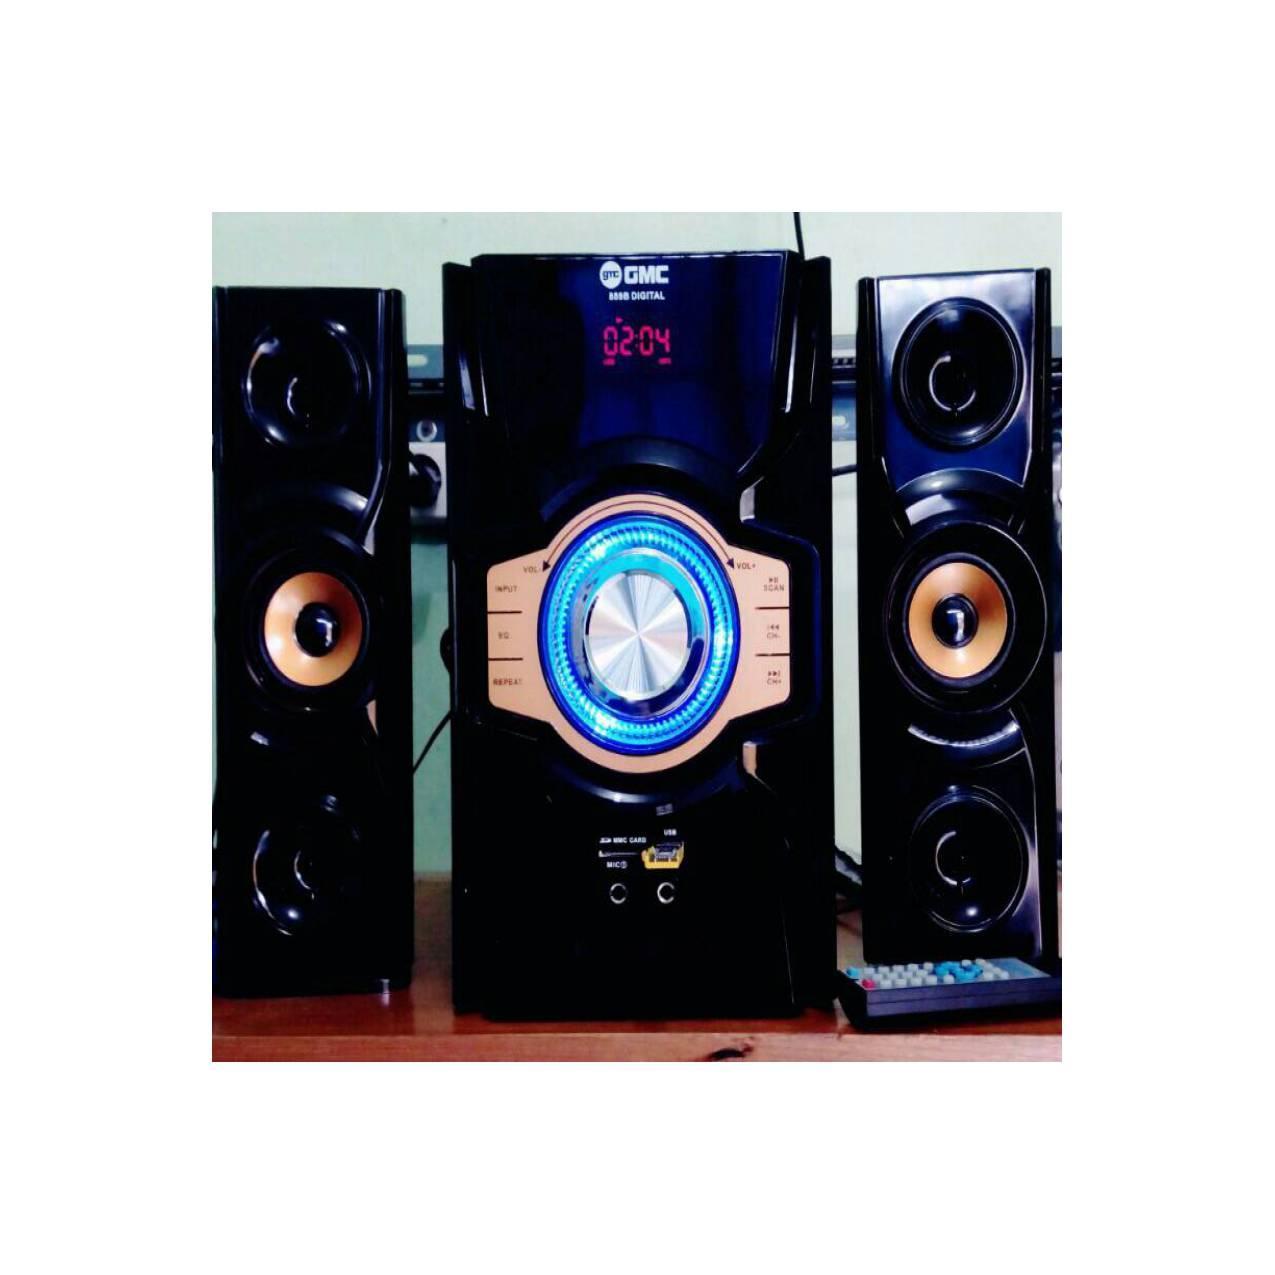 Speaker Aktif Multimedia GMC 889B Bluetooth, FM Radio, Remote, Karaoke